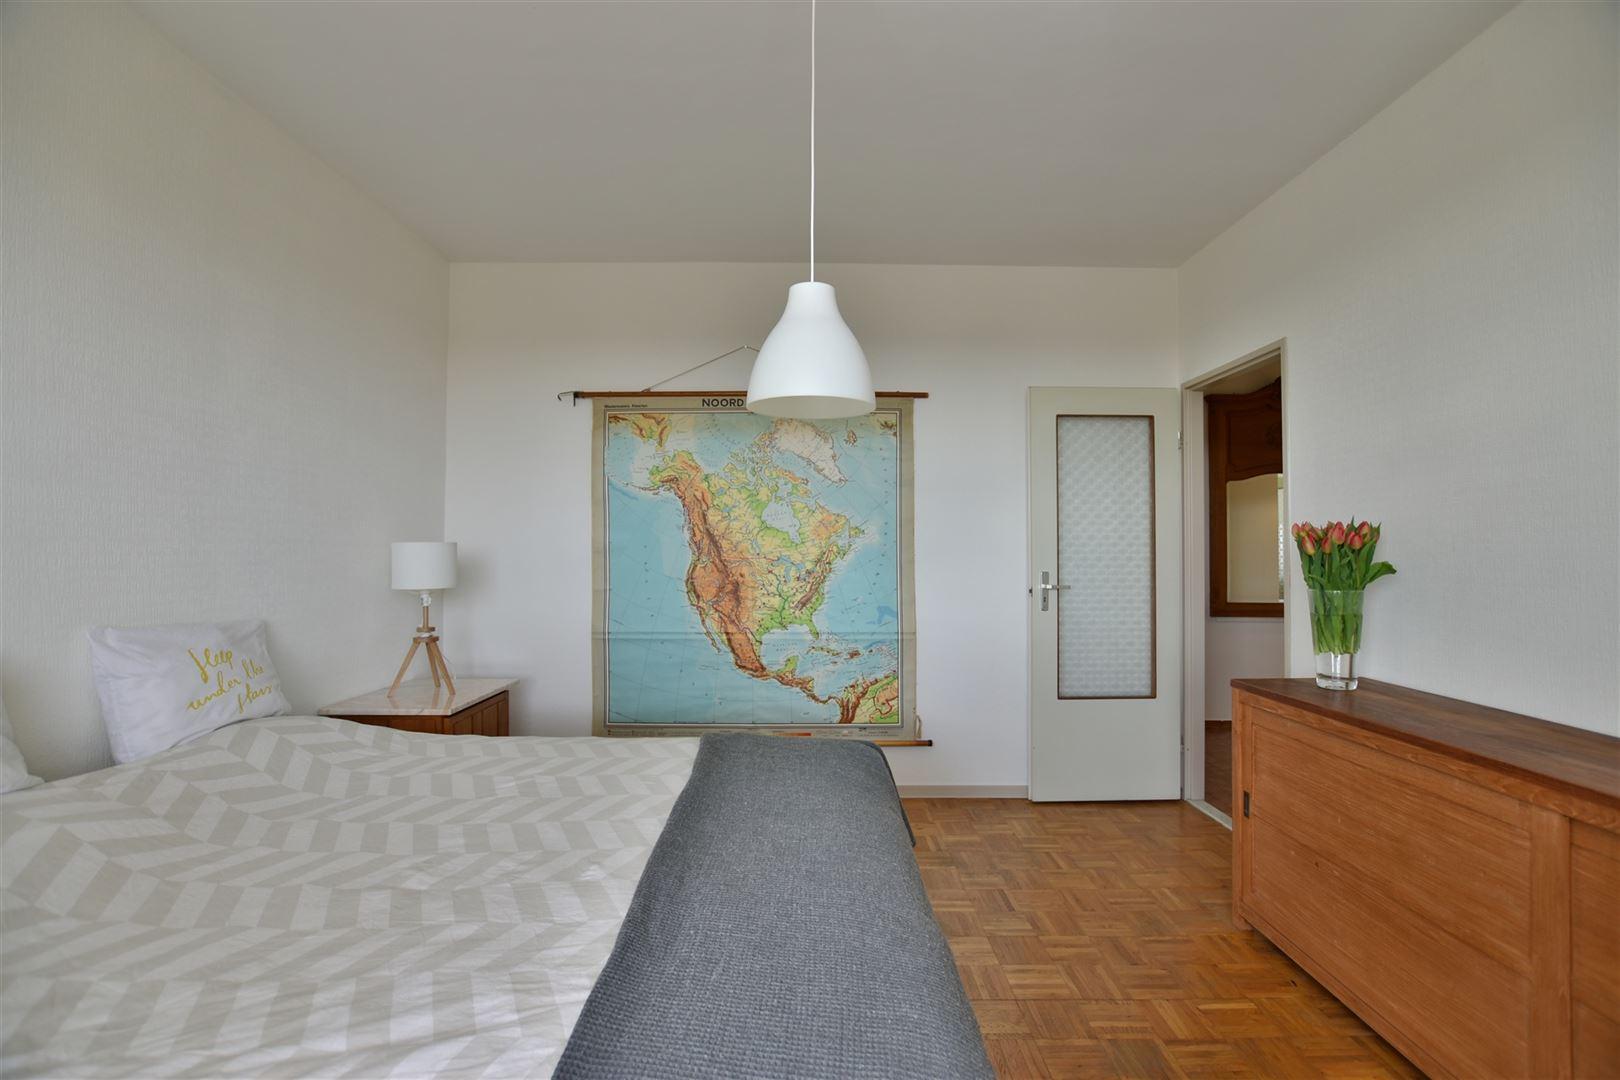 Foto 5 : Appartement te 9200 DENDERMONDE (België) - Prijs € 169.000